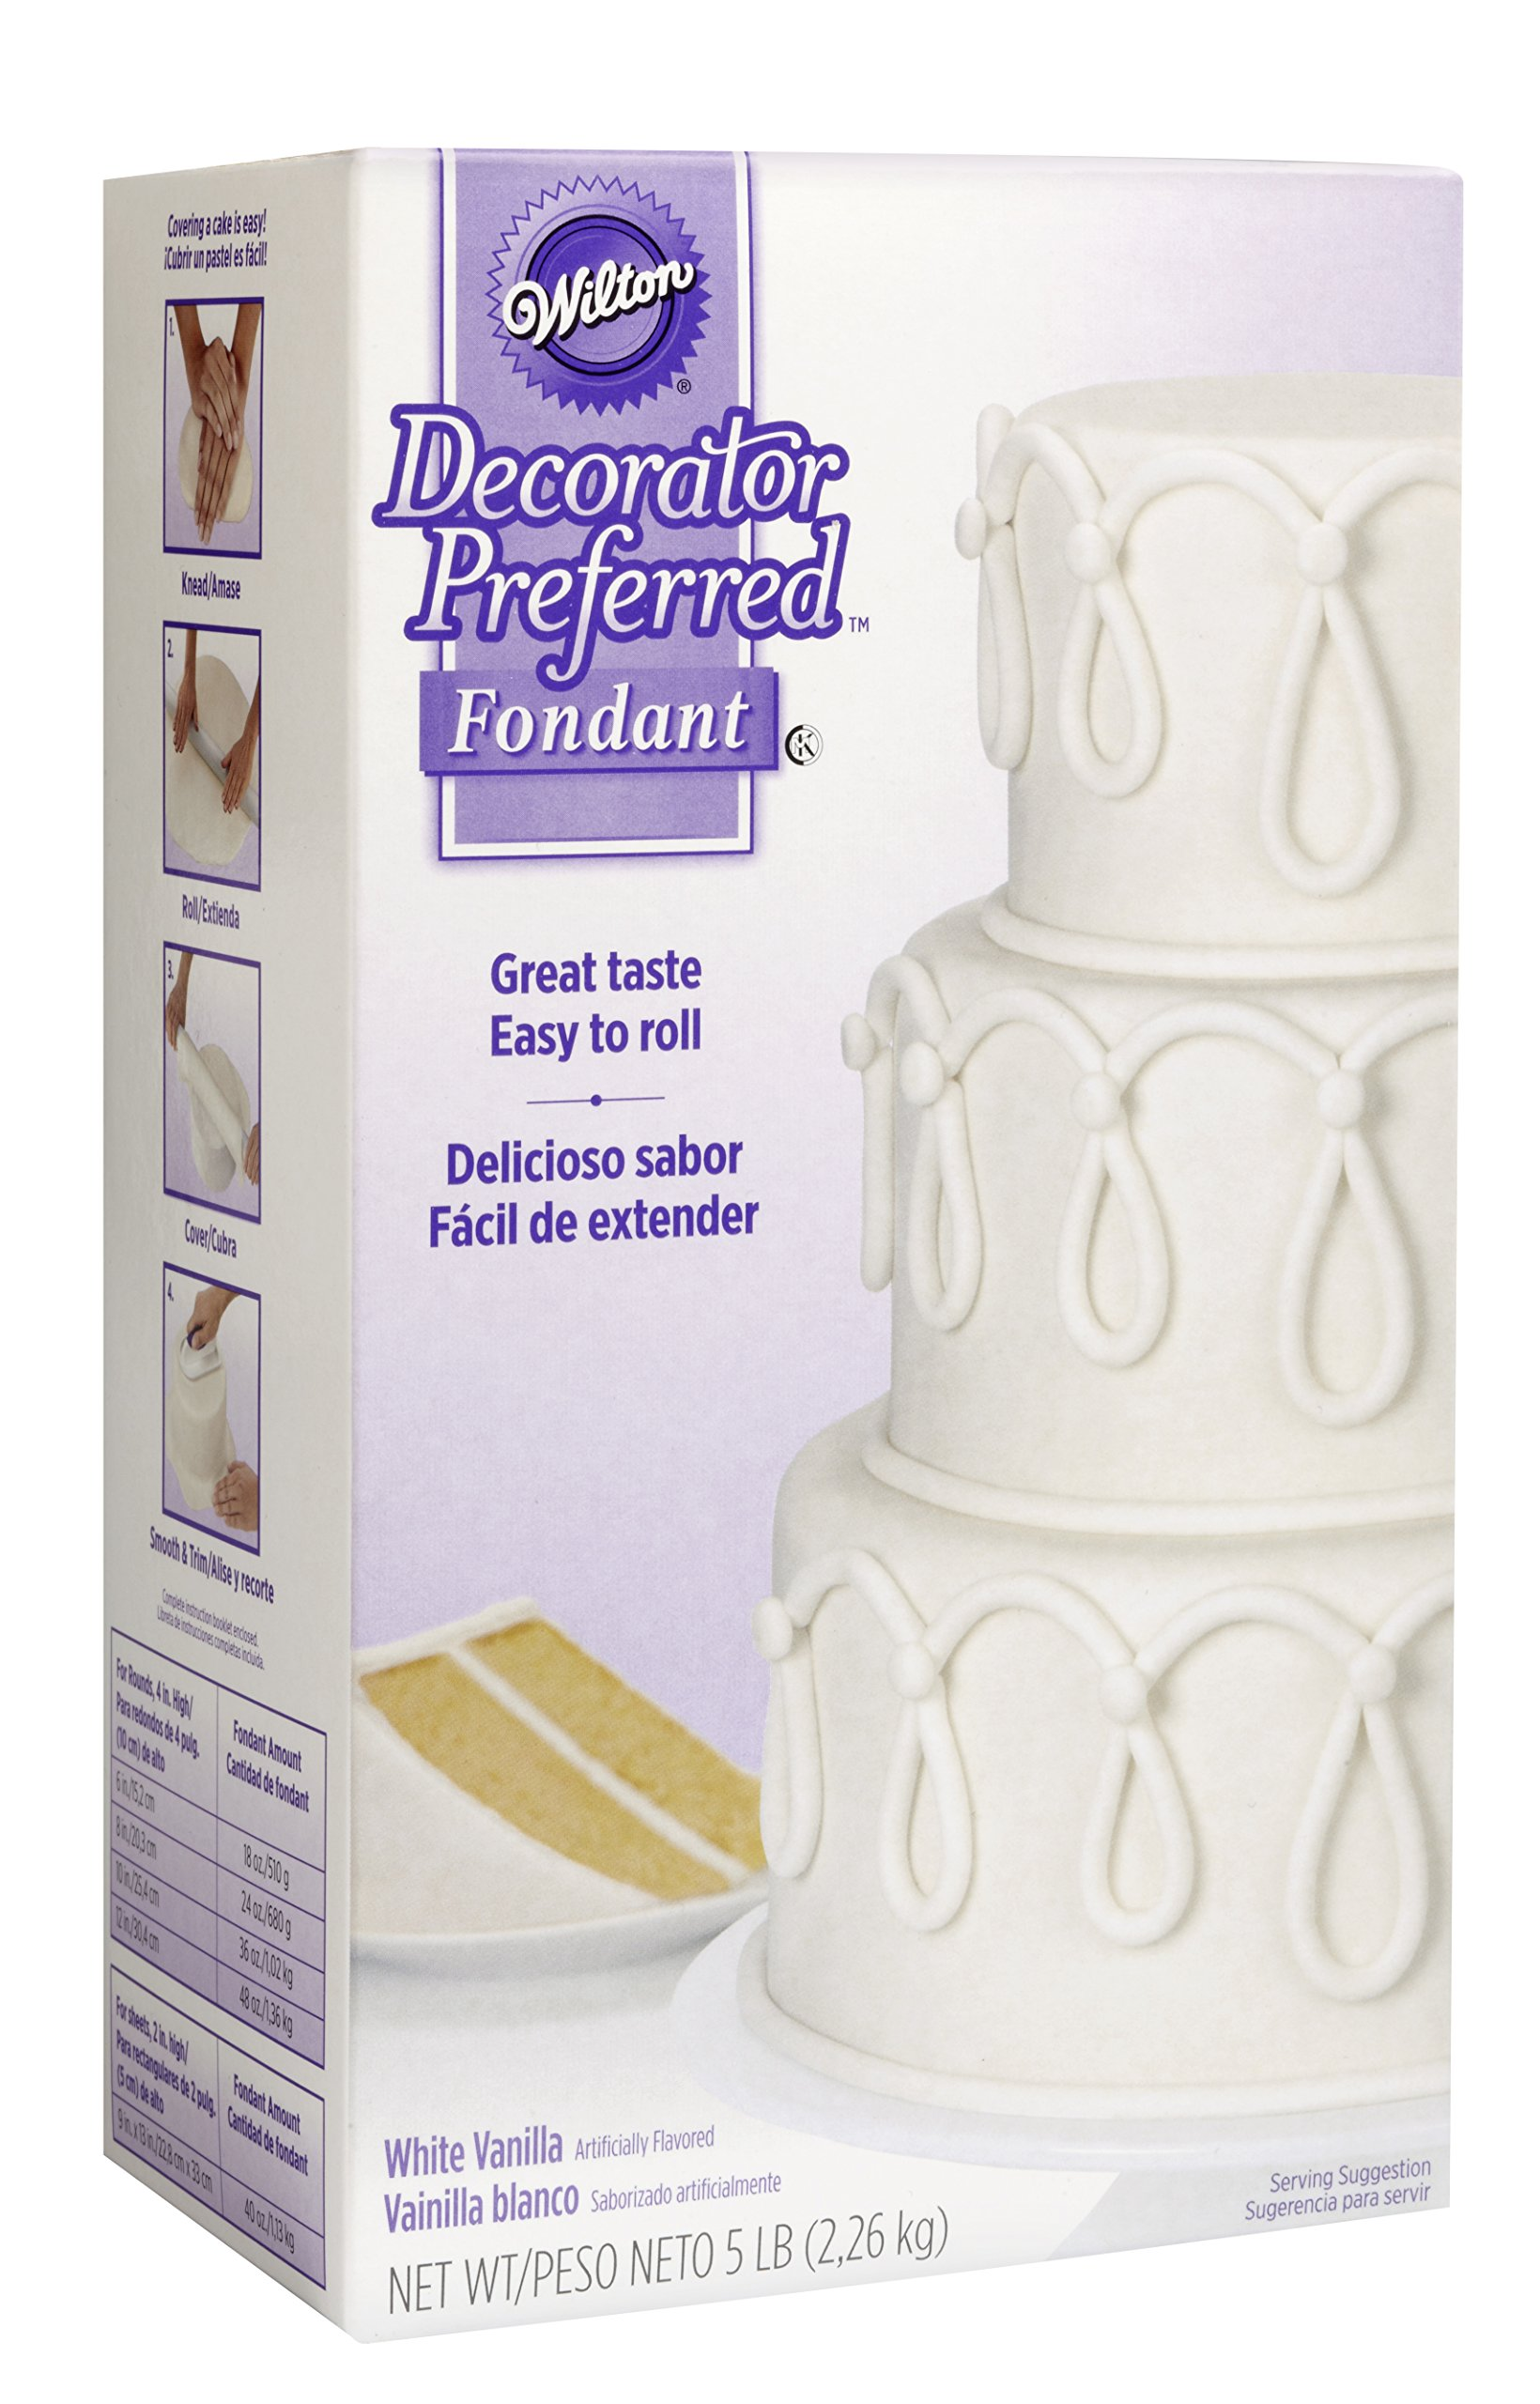 Wilton Decorator Preferred White Fondant, 5 lb. by Wilton (Image #2)